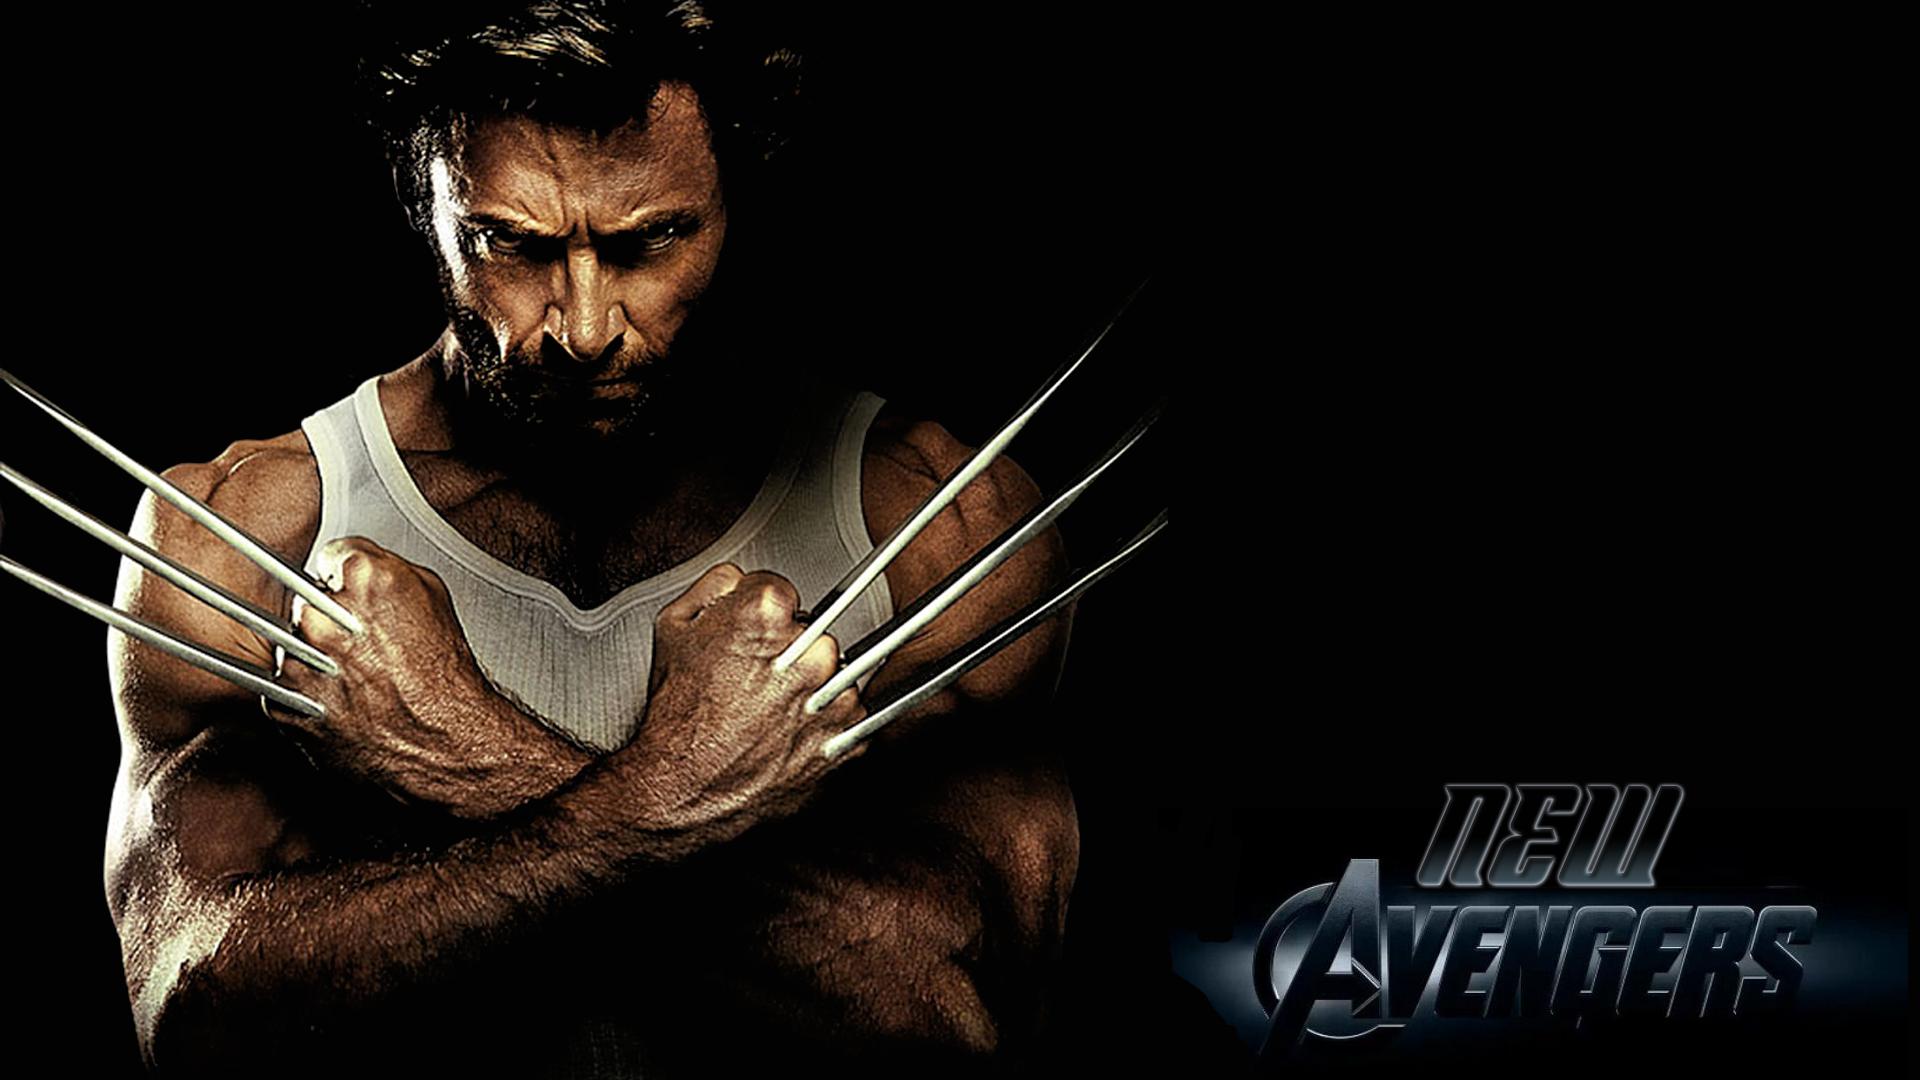 Free Download Wolverine Hd Wallpaper Fullhdwpp Full Hd Wallpapers 1920x1080 1920x1080 For Your Desktop Mobile Tablet Explore 45 Wolverine Wallpapers Hd X Men Wallpaper Hd X Men Logo Wallpaper